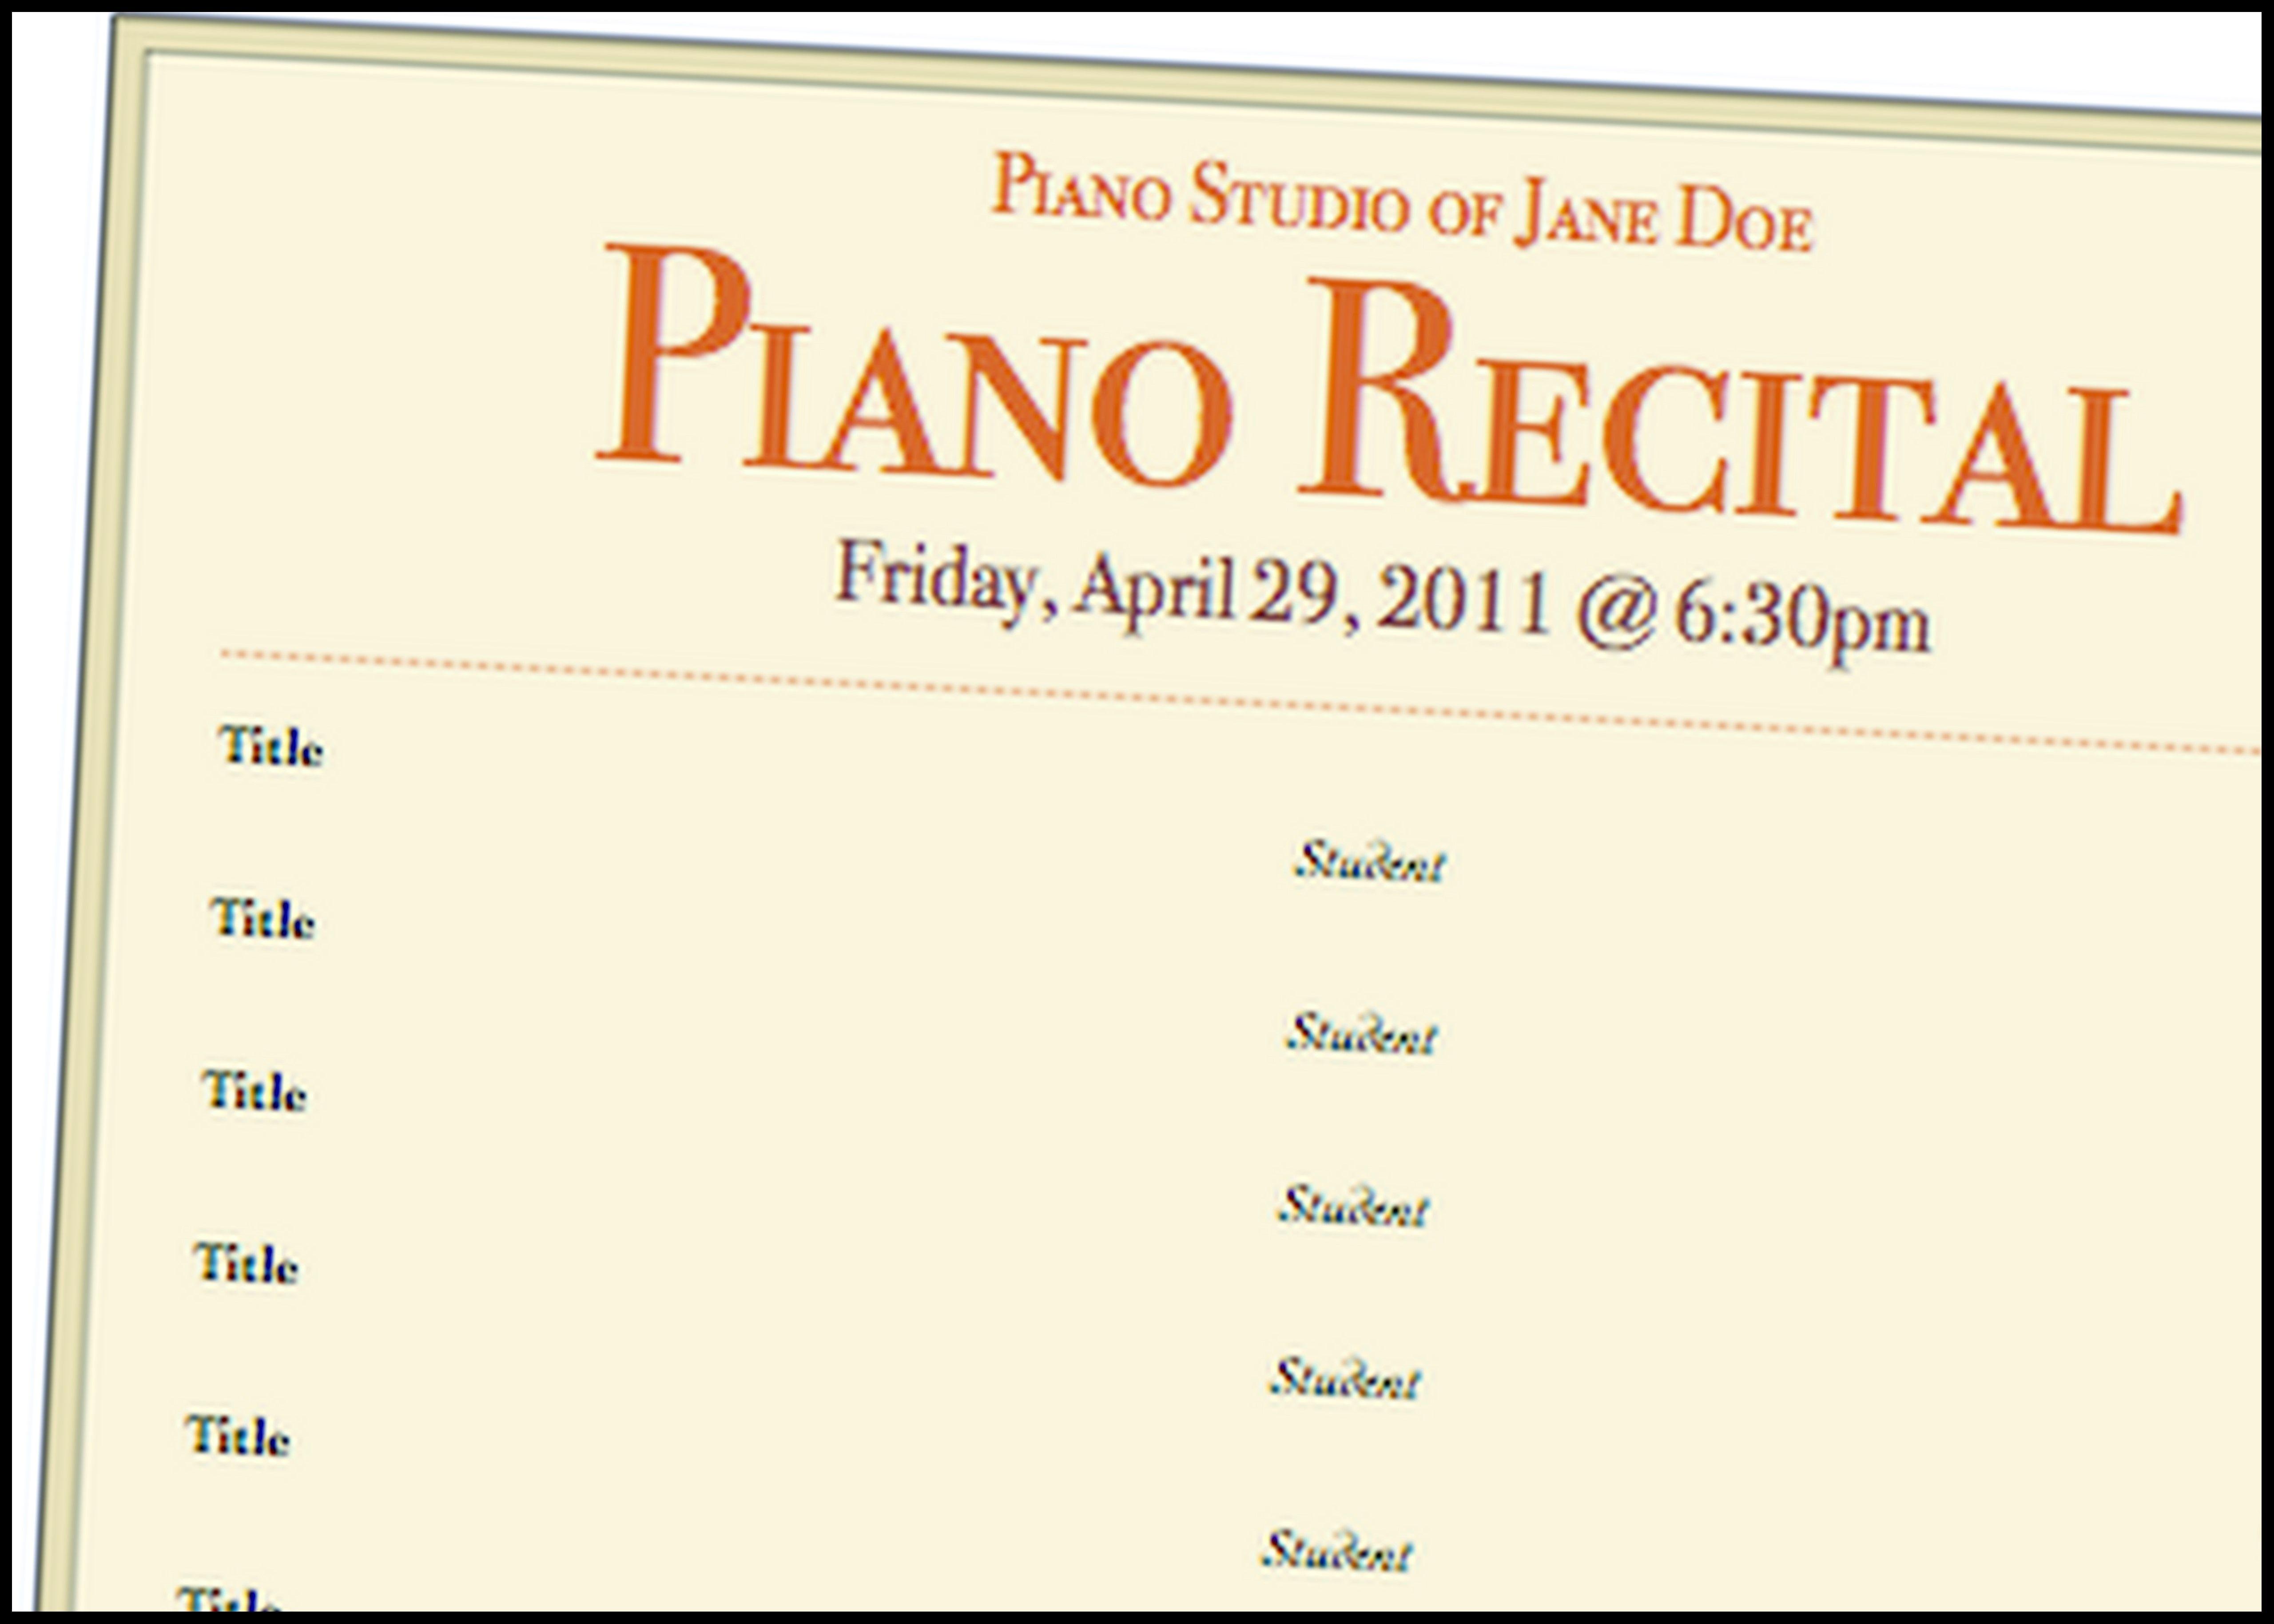 A Basic Piano Recital Program Template For Free! #music #teaching - Free Printable Piano Recital Certificates